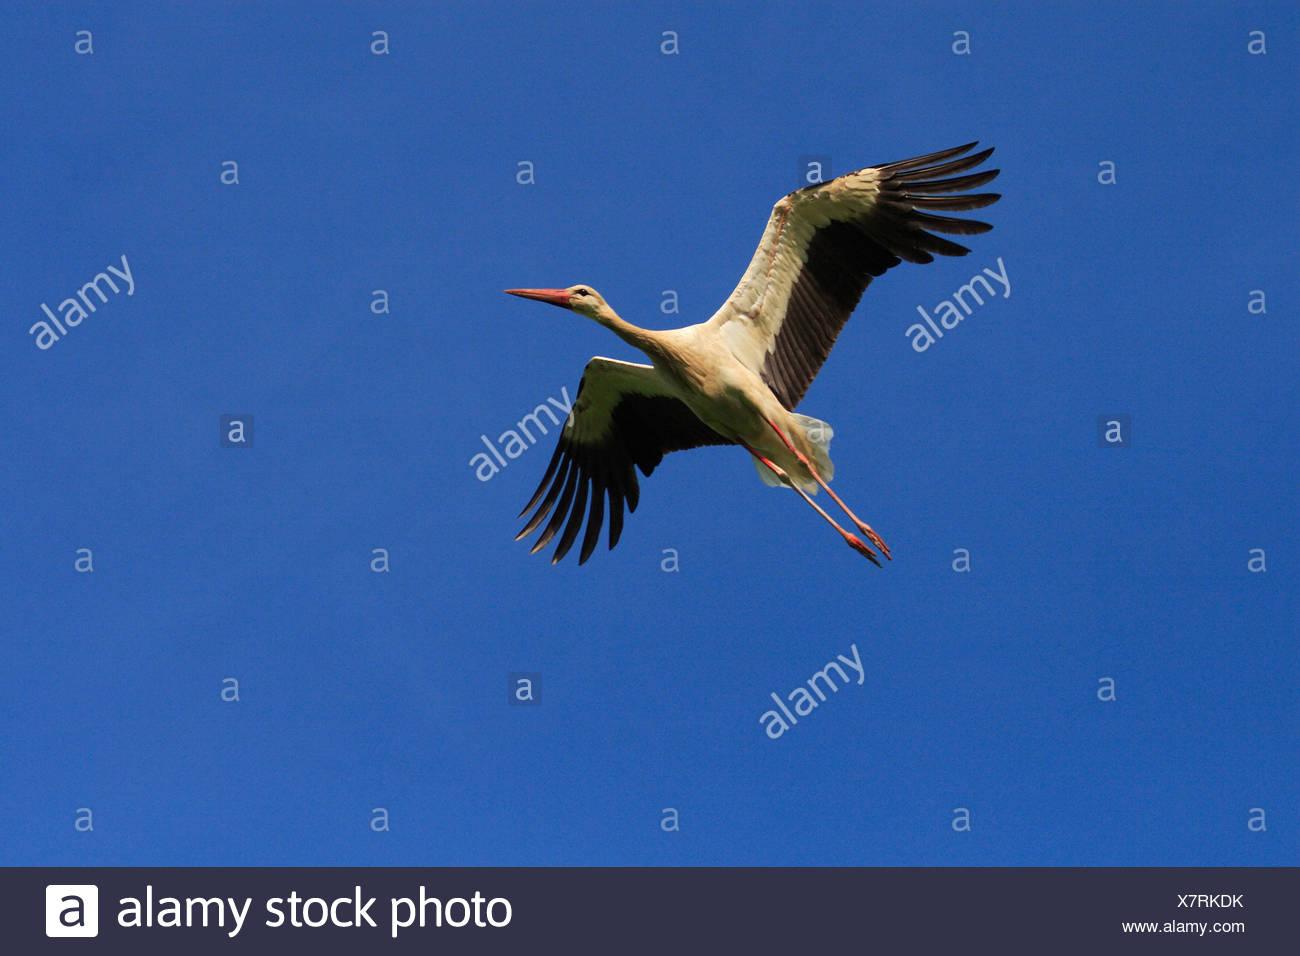 white stork stork Ciconia ciconia Flying Blue sky Summer Switzerland Europe Bird Stock Photo